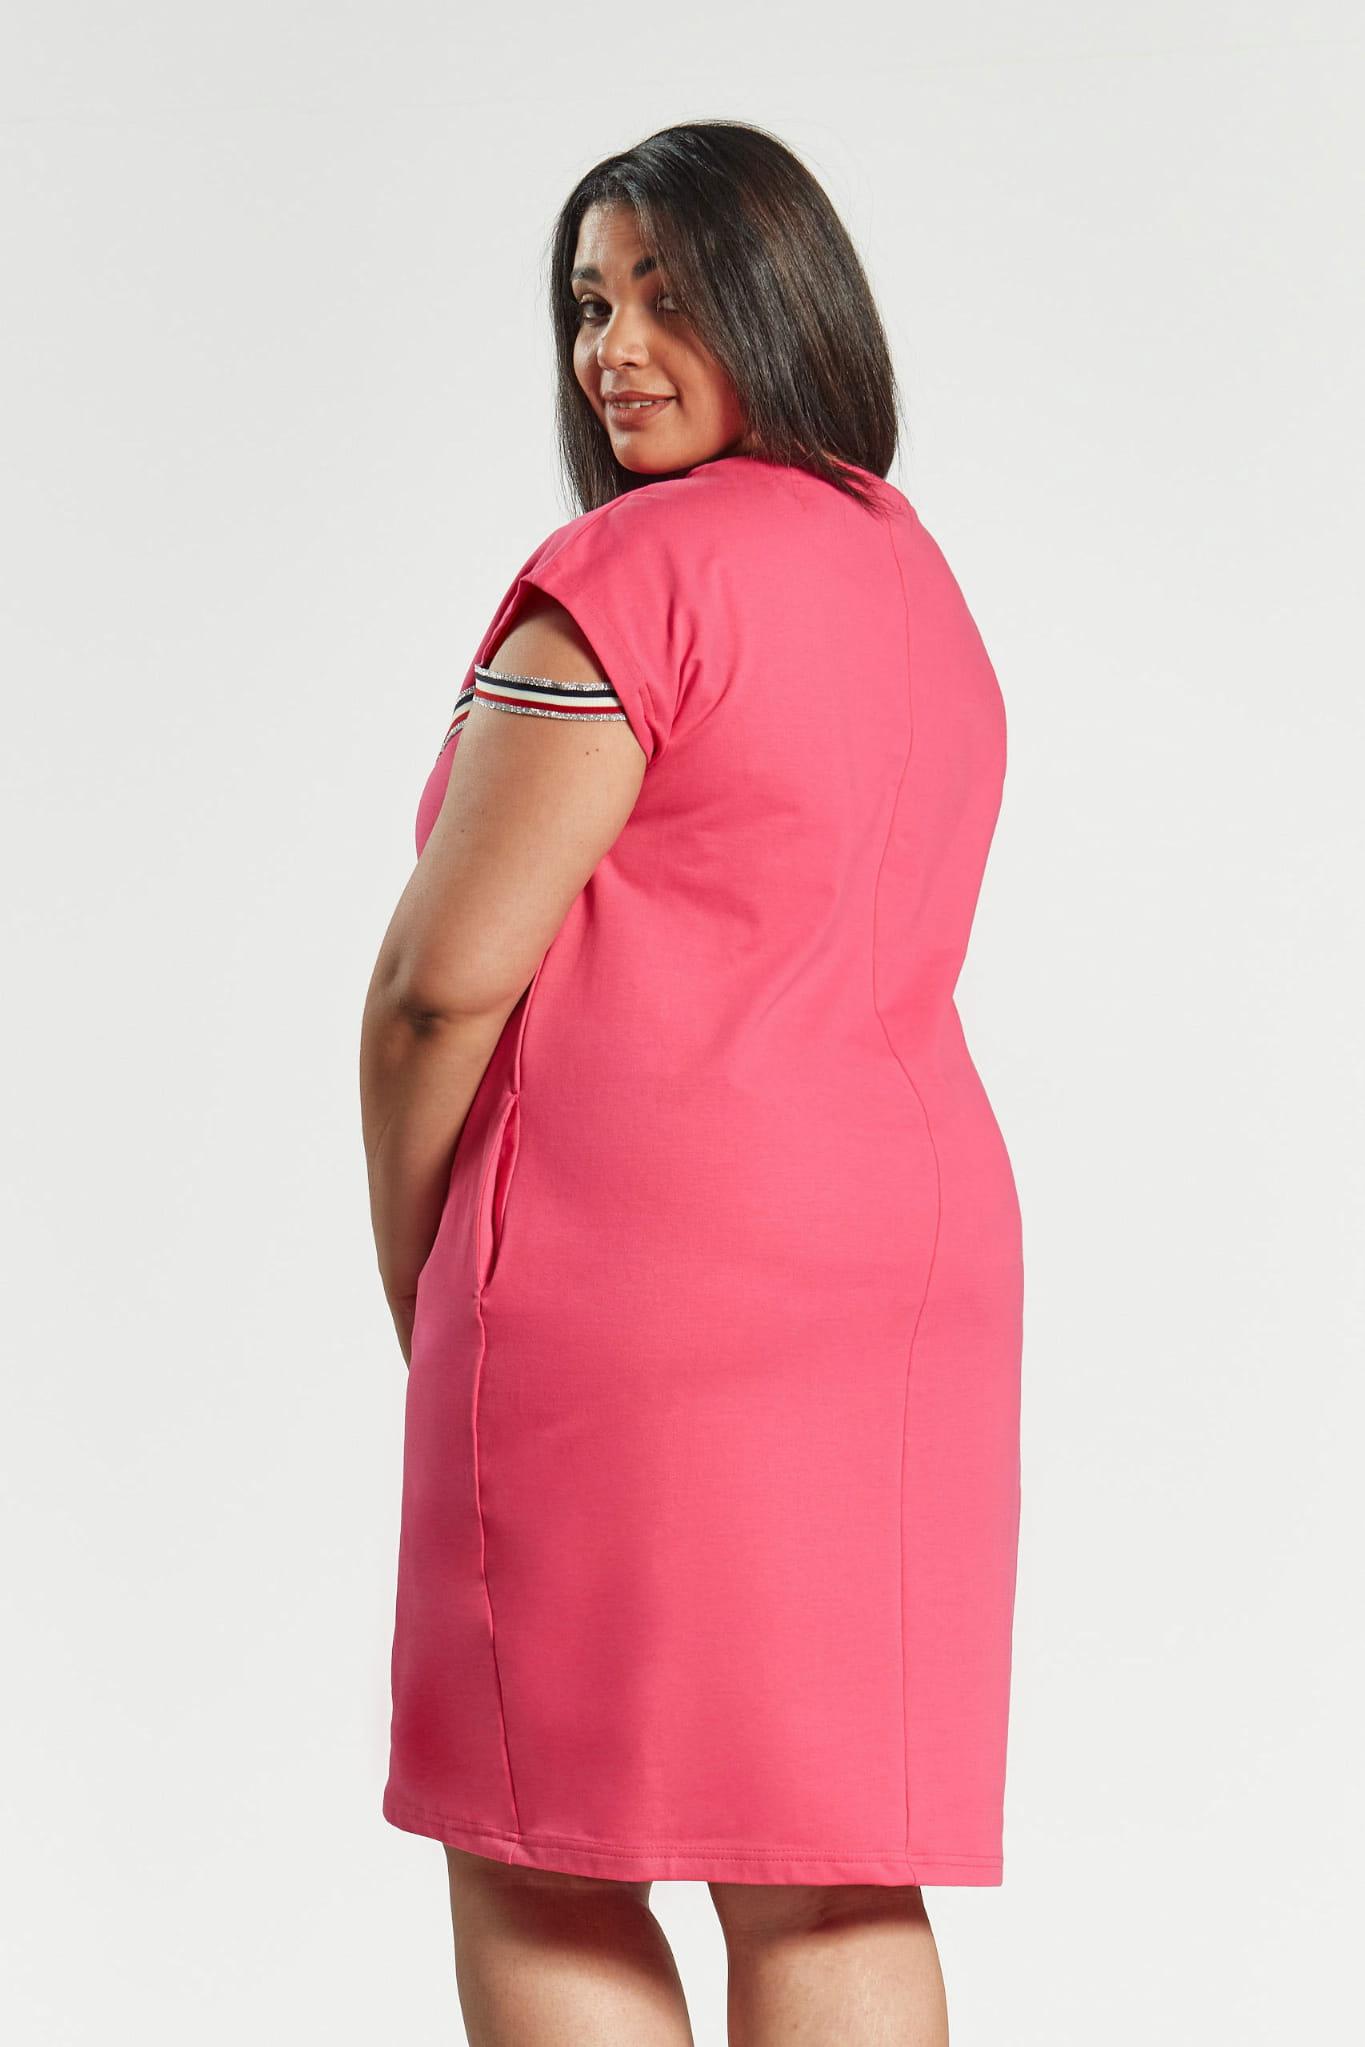 083fb3b9f7 Amarantowa sukienka Jula z lampasami duże rozmiary OVERSIZE PLUS ...